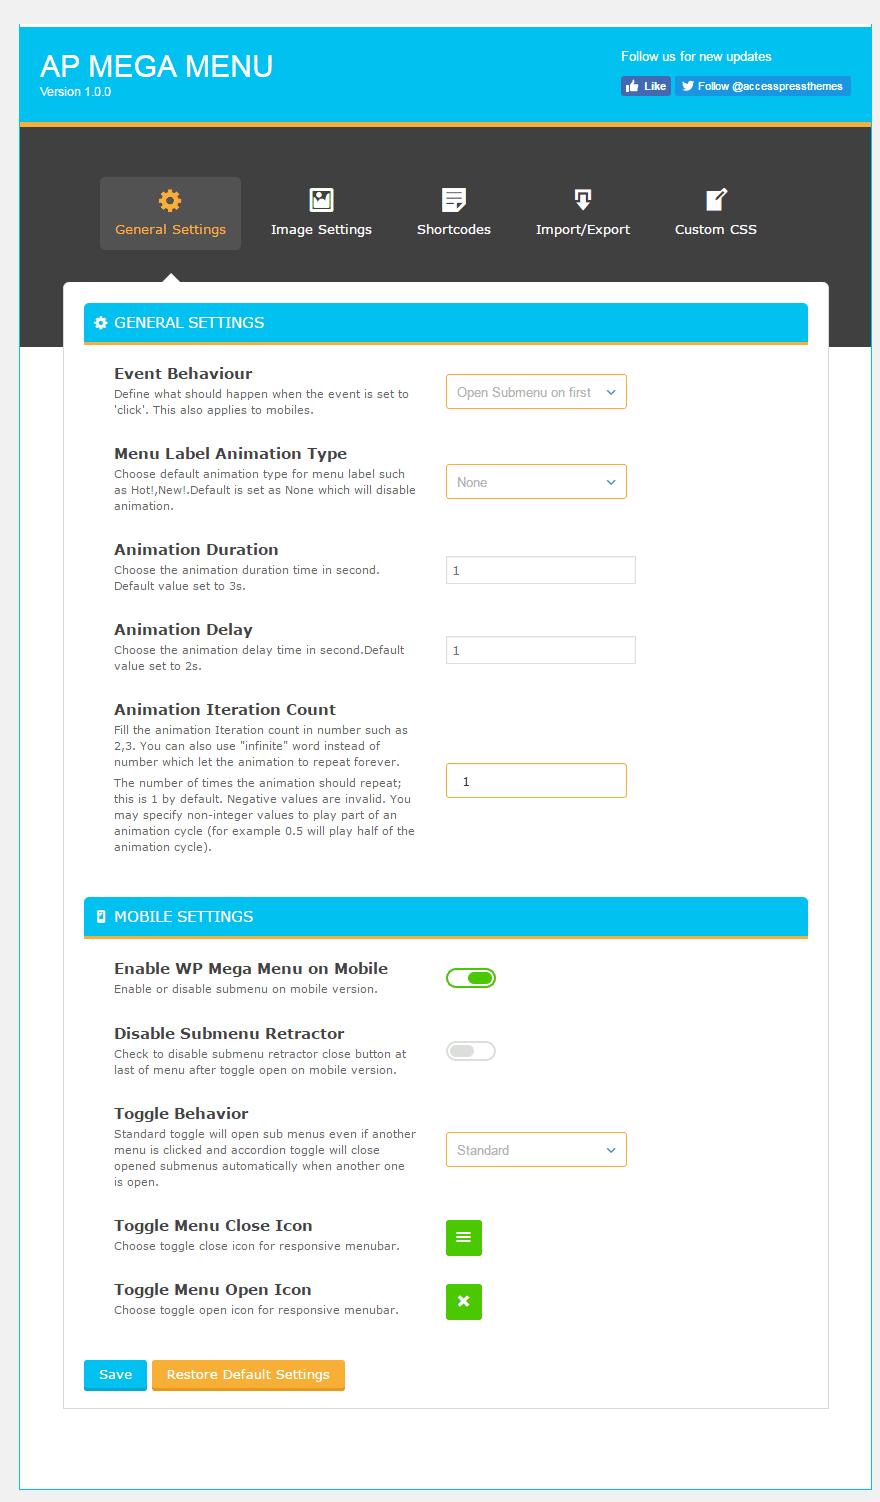 general settings 1 - How to add Mega Menu on WordPress Website Using AP Mega Menu plugin? (Step by Step Guide)